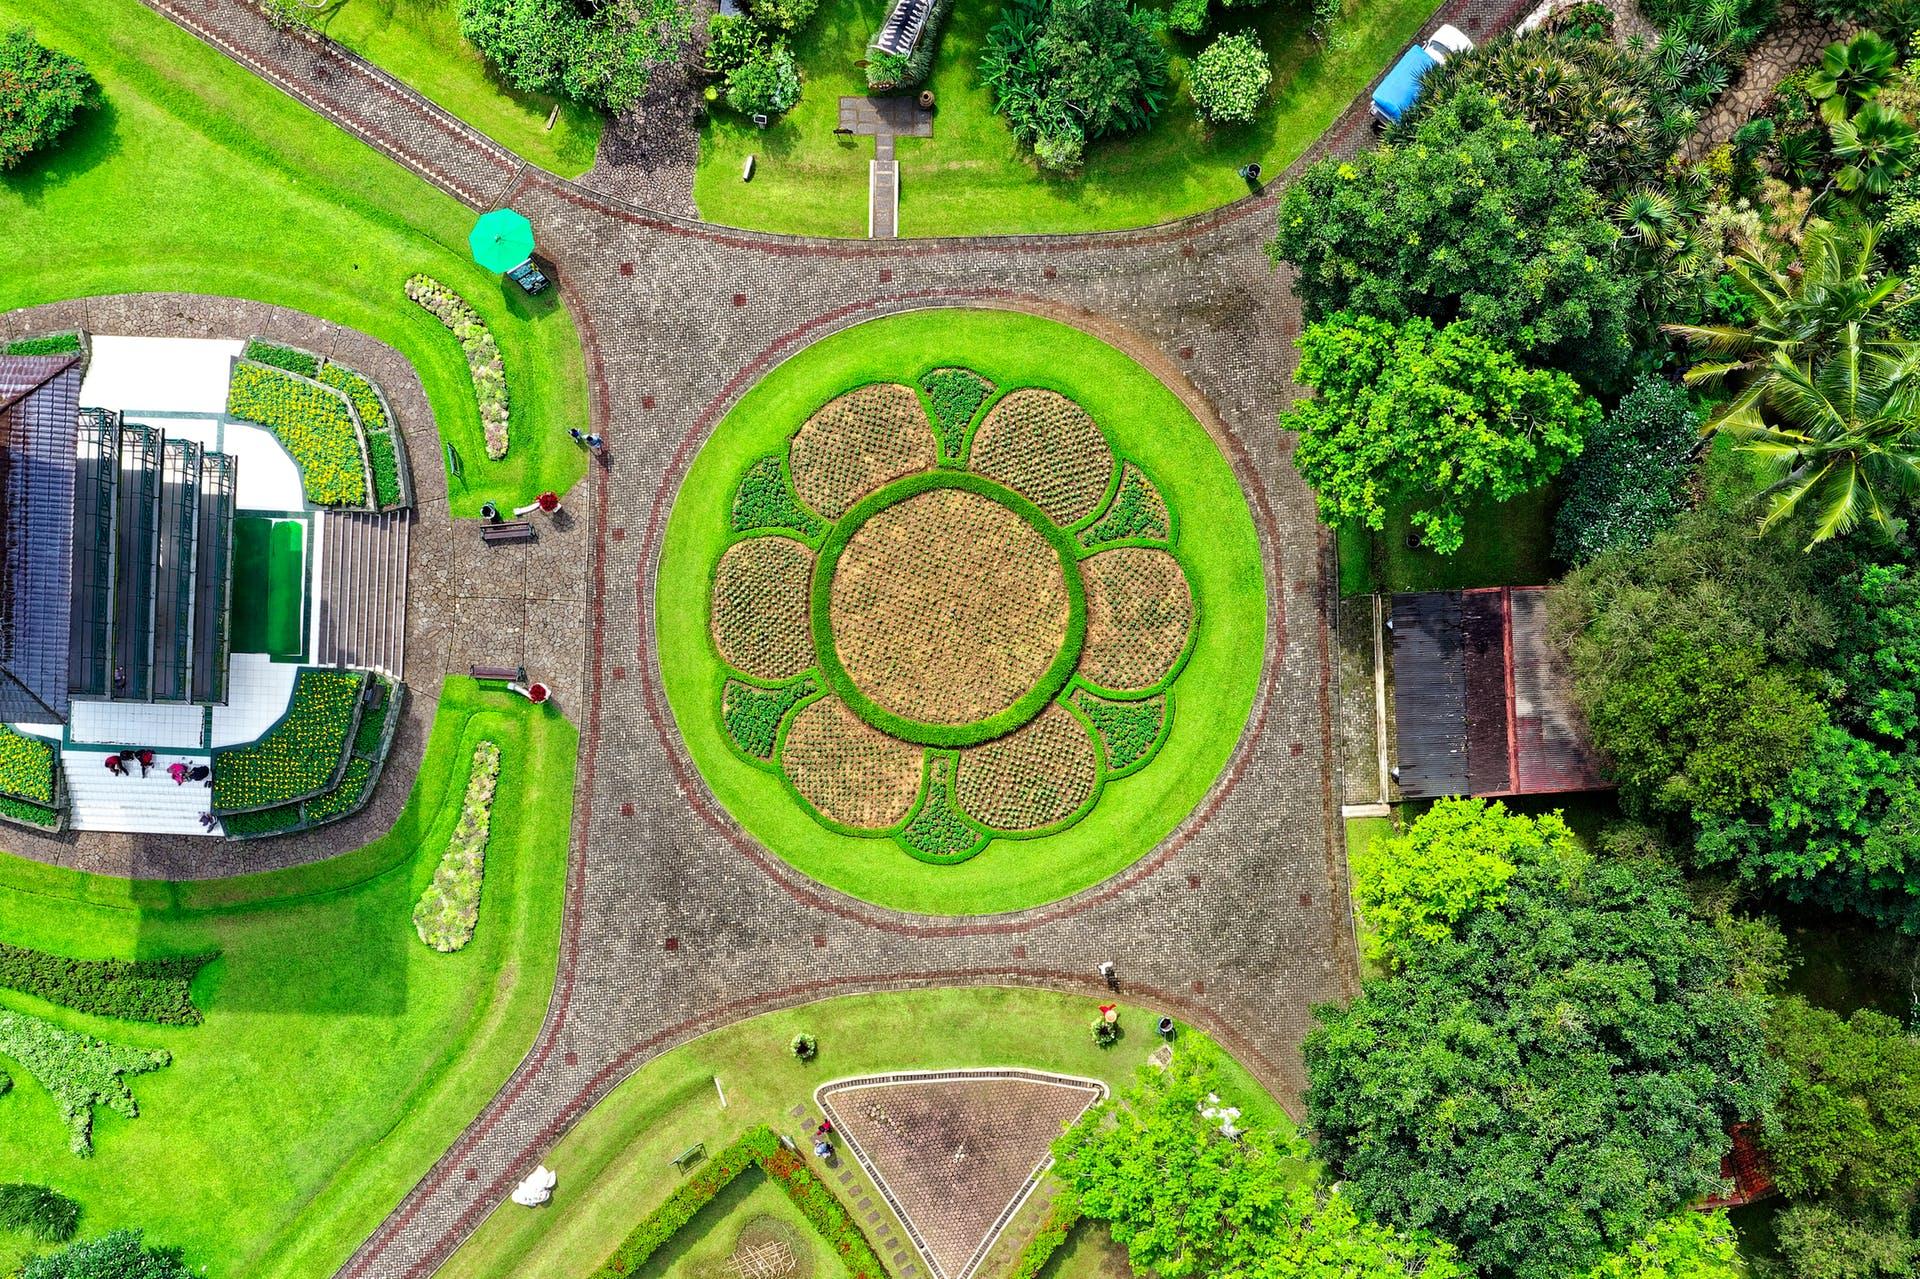 drone shot bird's eye view garden indonesia aerial shot from above